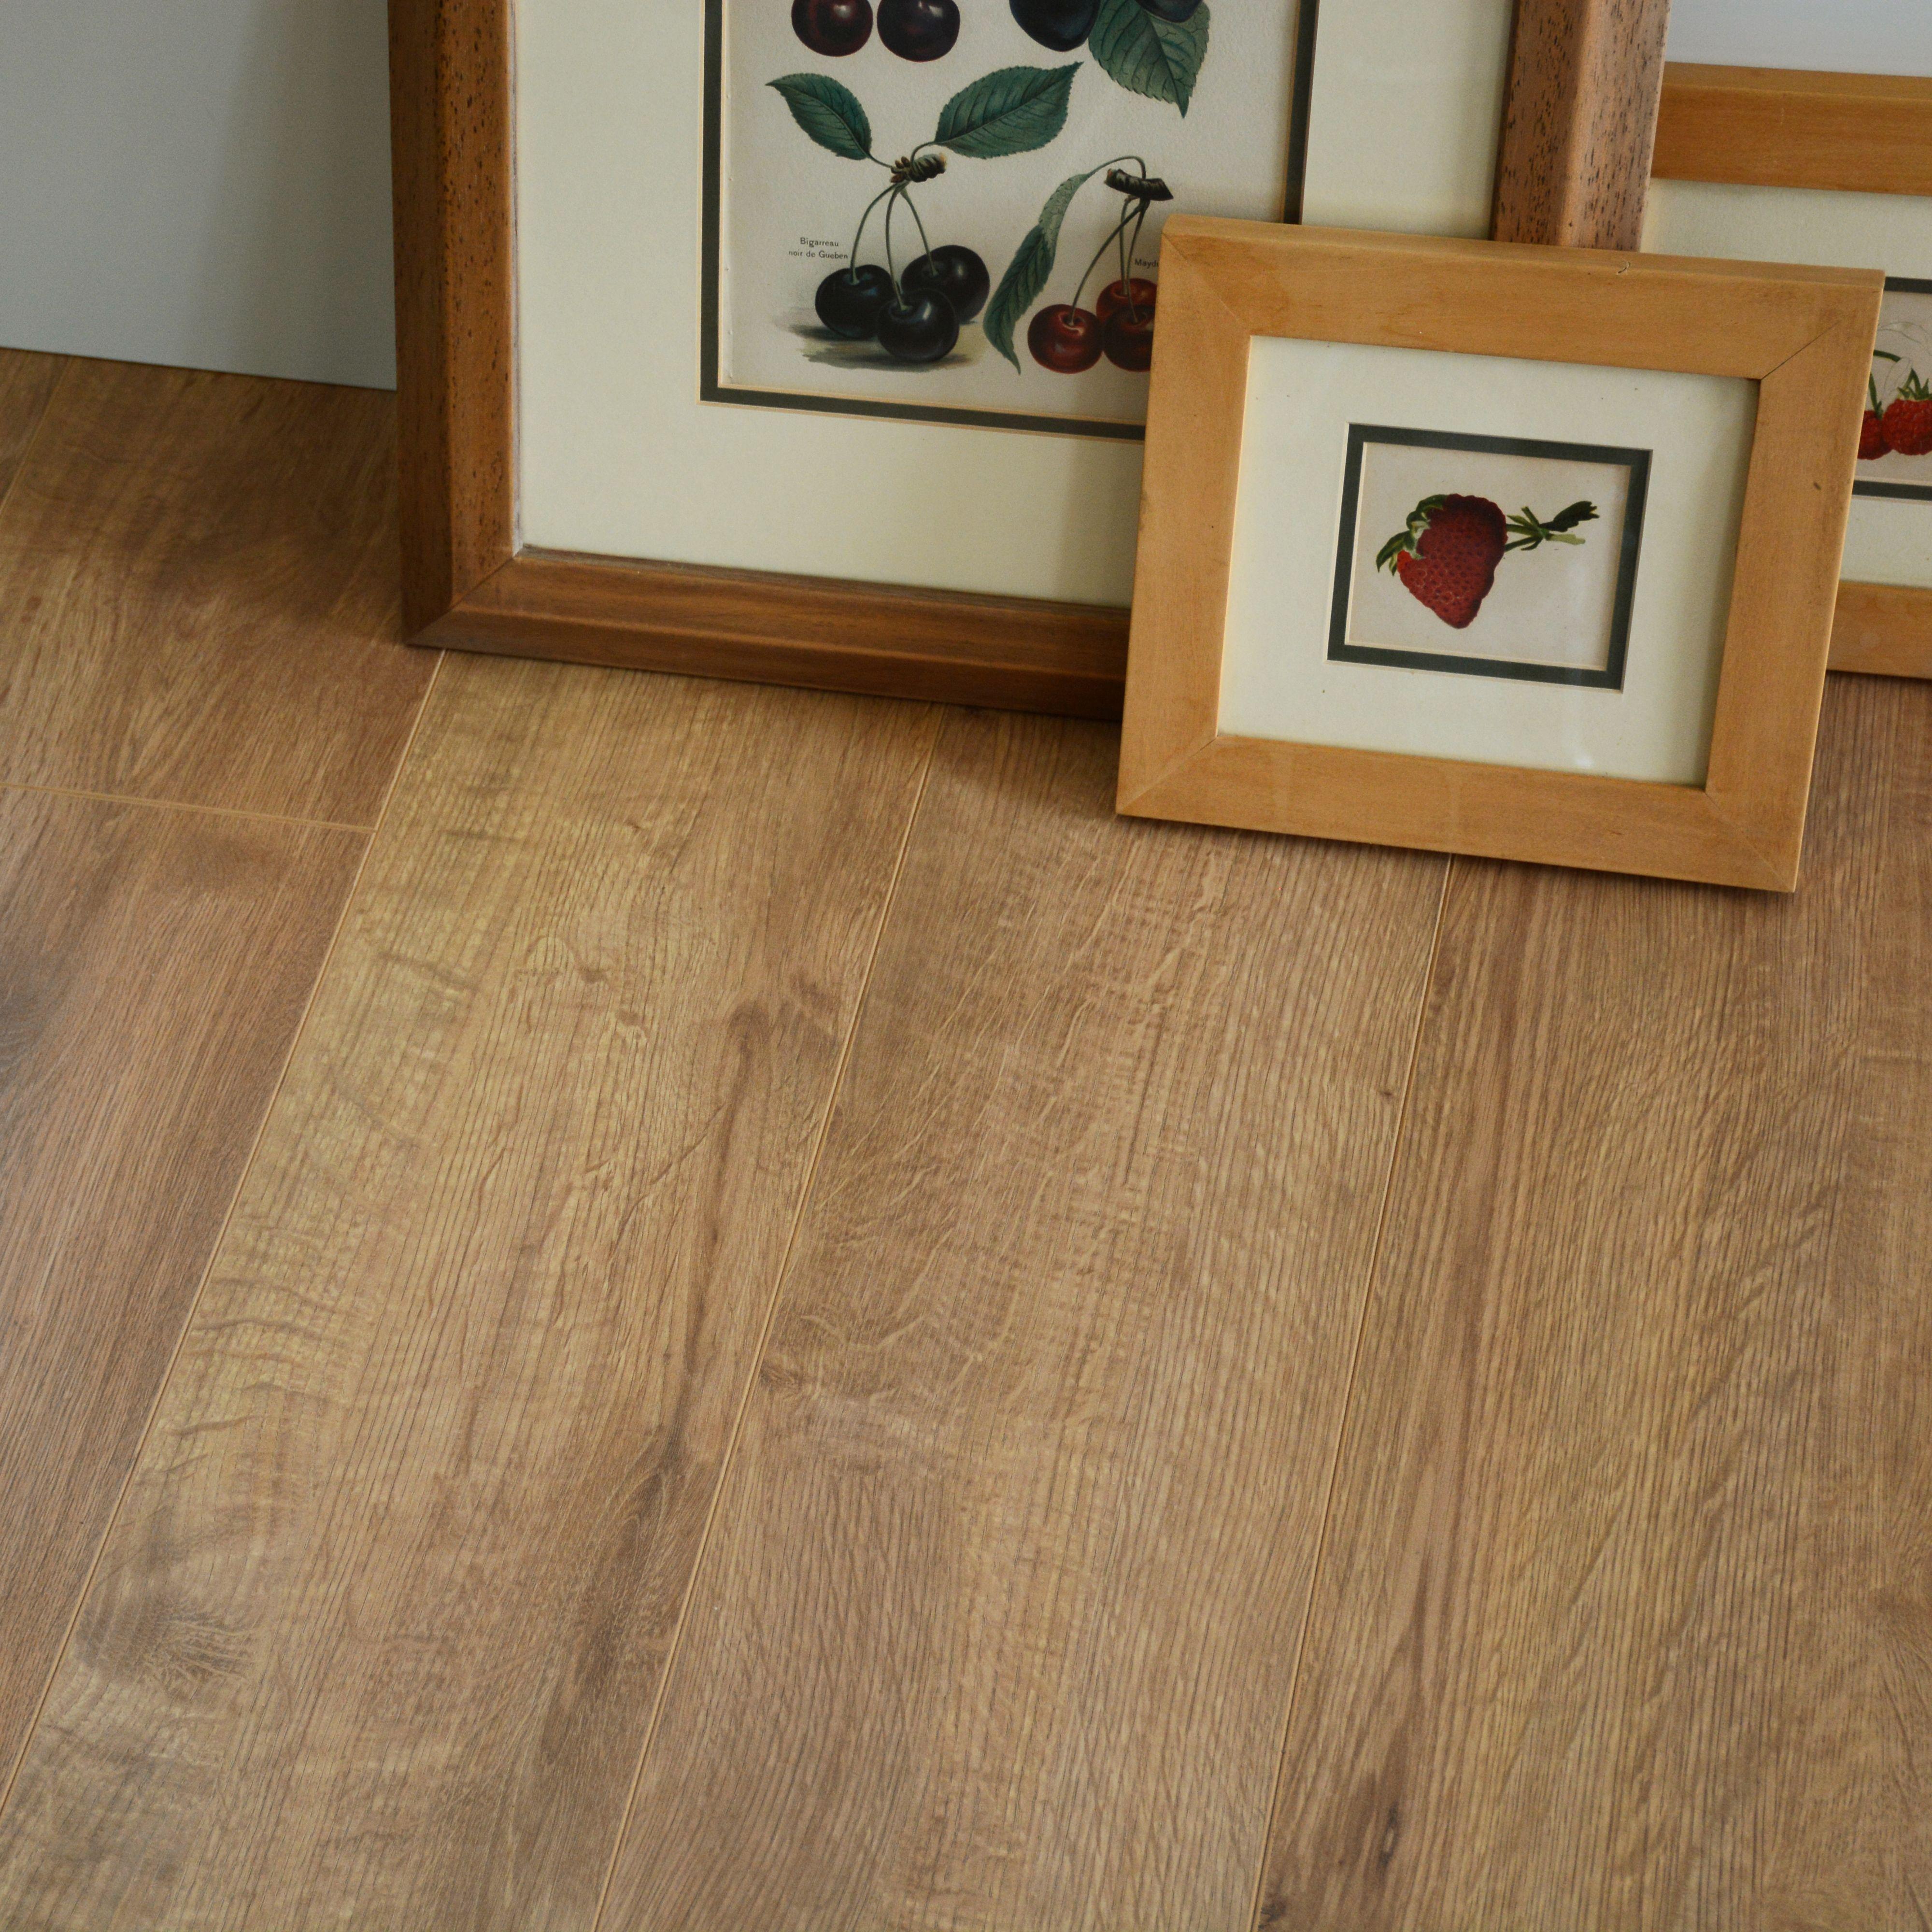 laminate ideas new concertino new england traditional oak effect laminate flooring 1.48 m²  pack | YZMBLXK